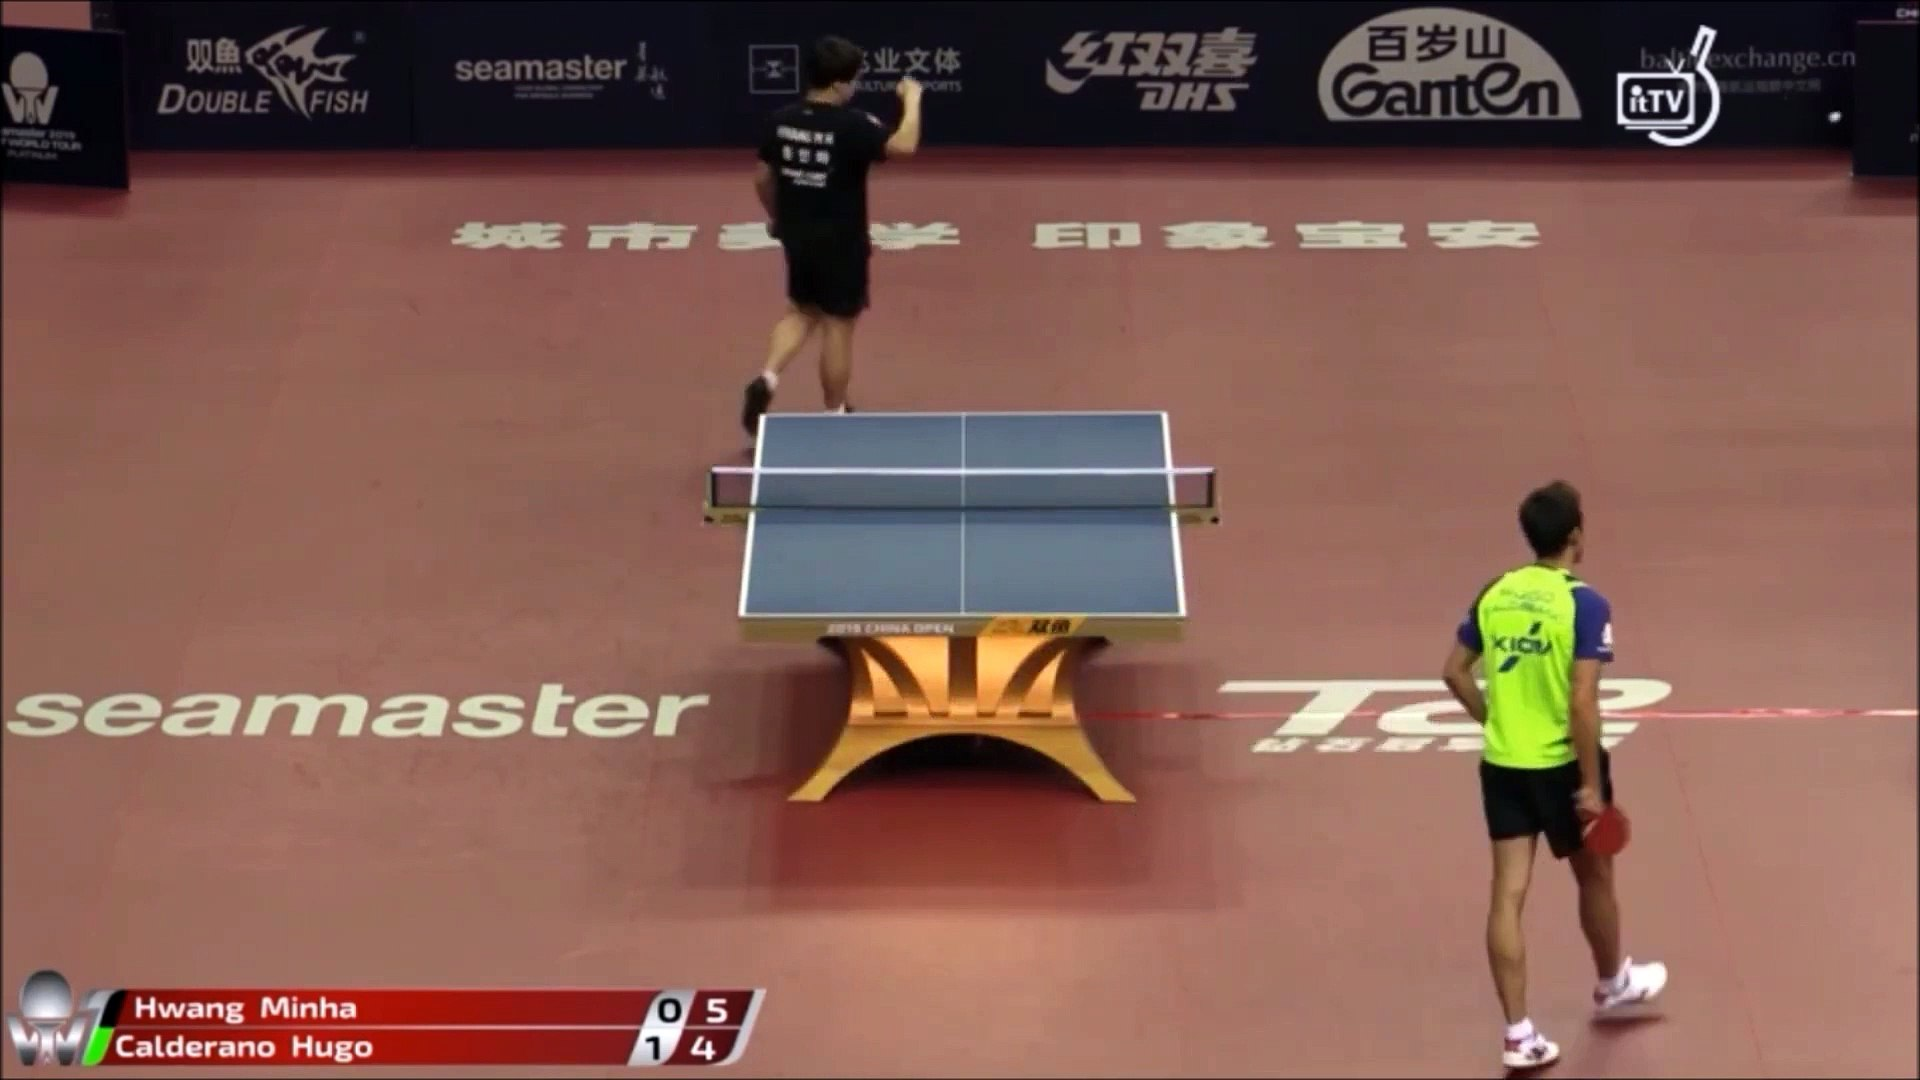 Aberto da China 2019 - Hugo Calderano x Hwang Minha - Tênis de Mesa